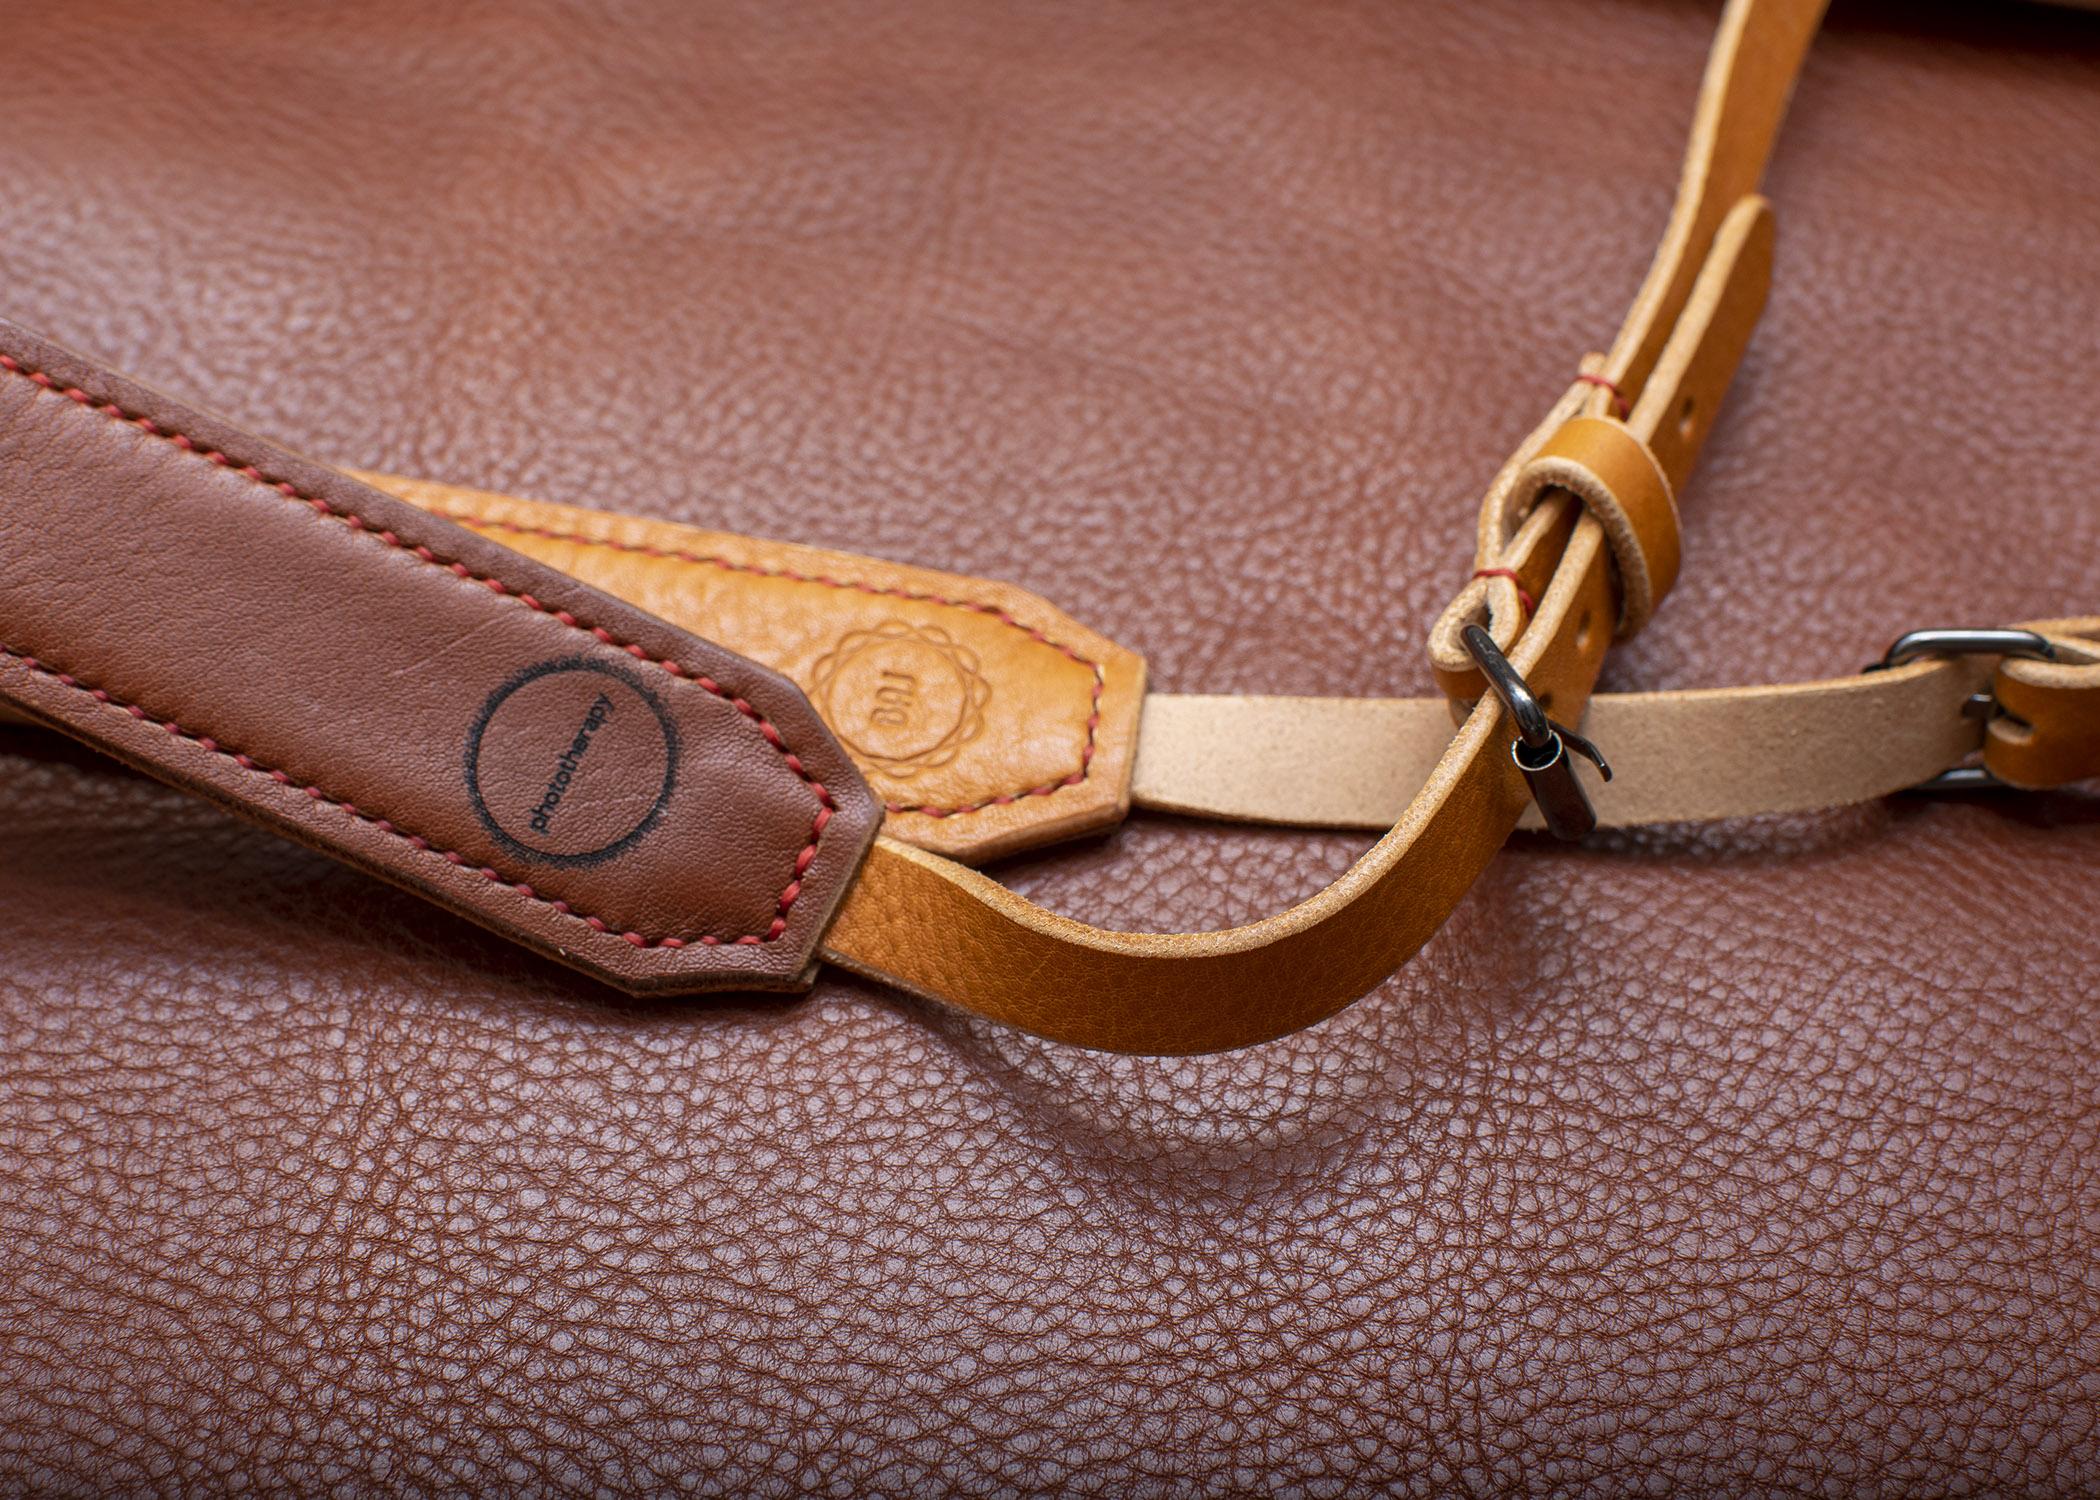 camera strap on brown